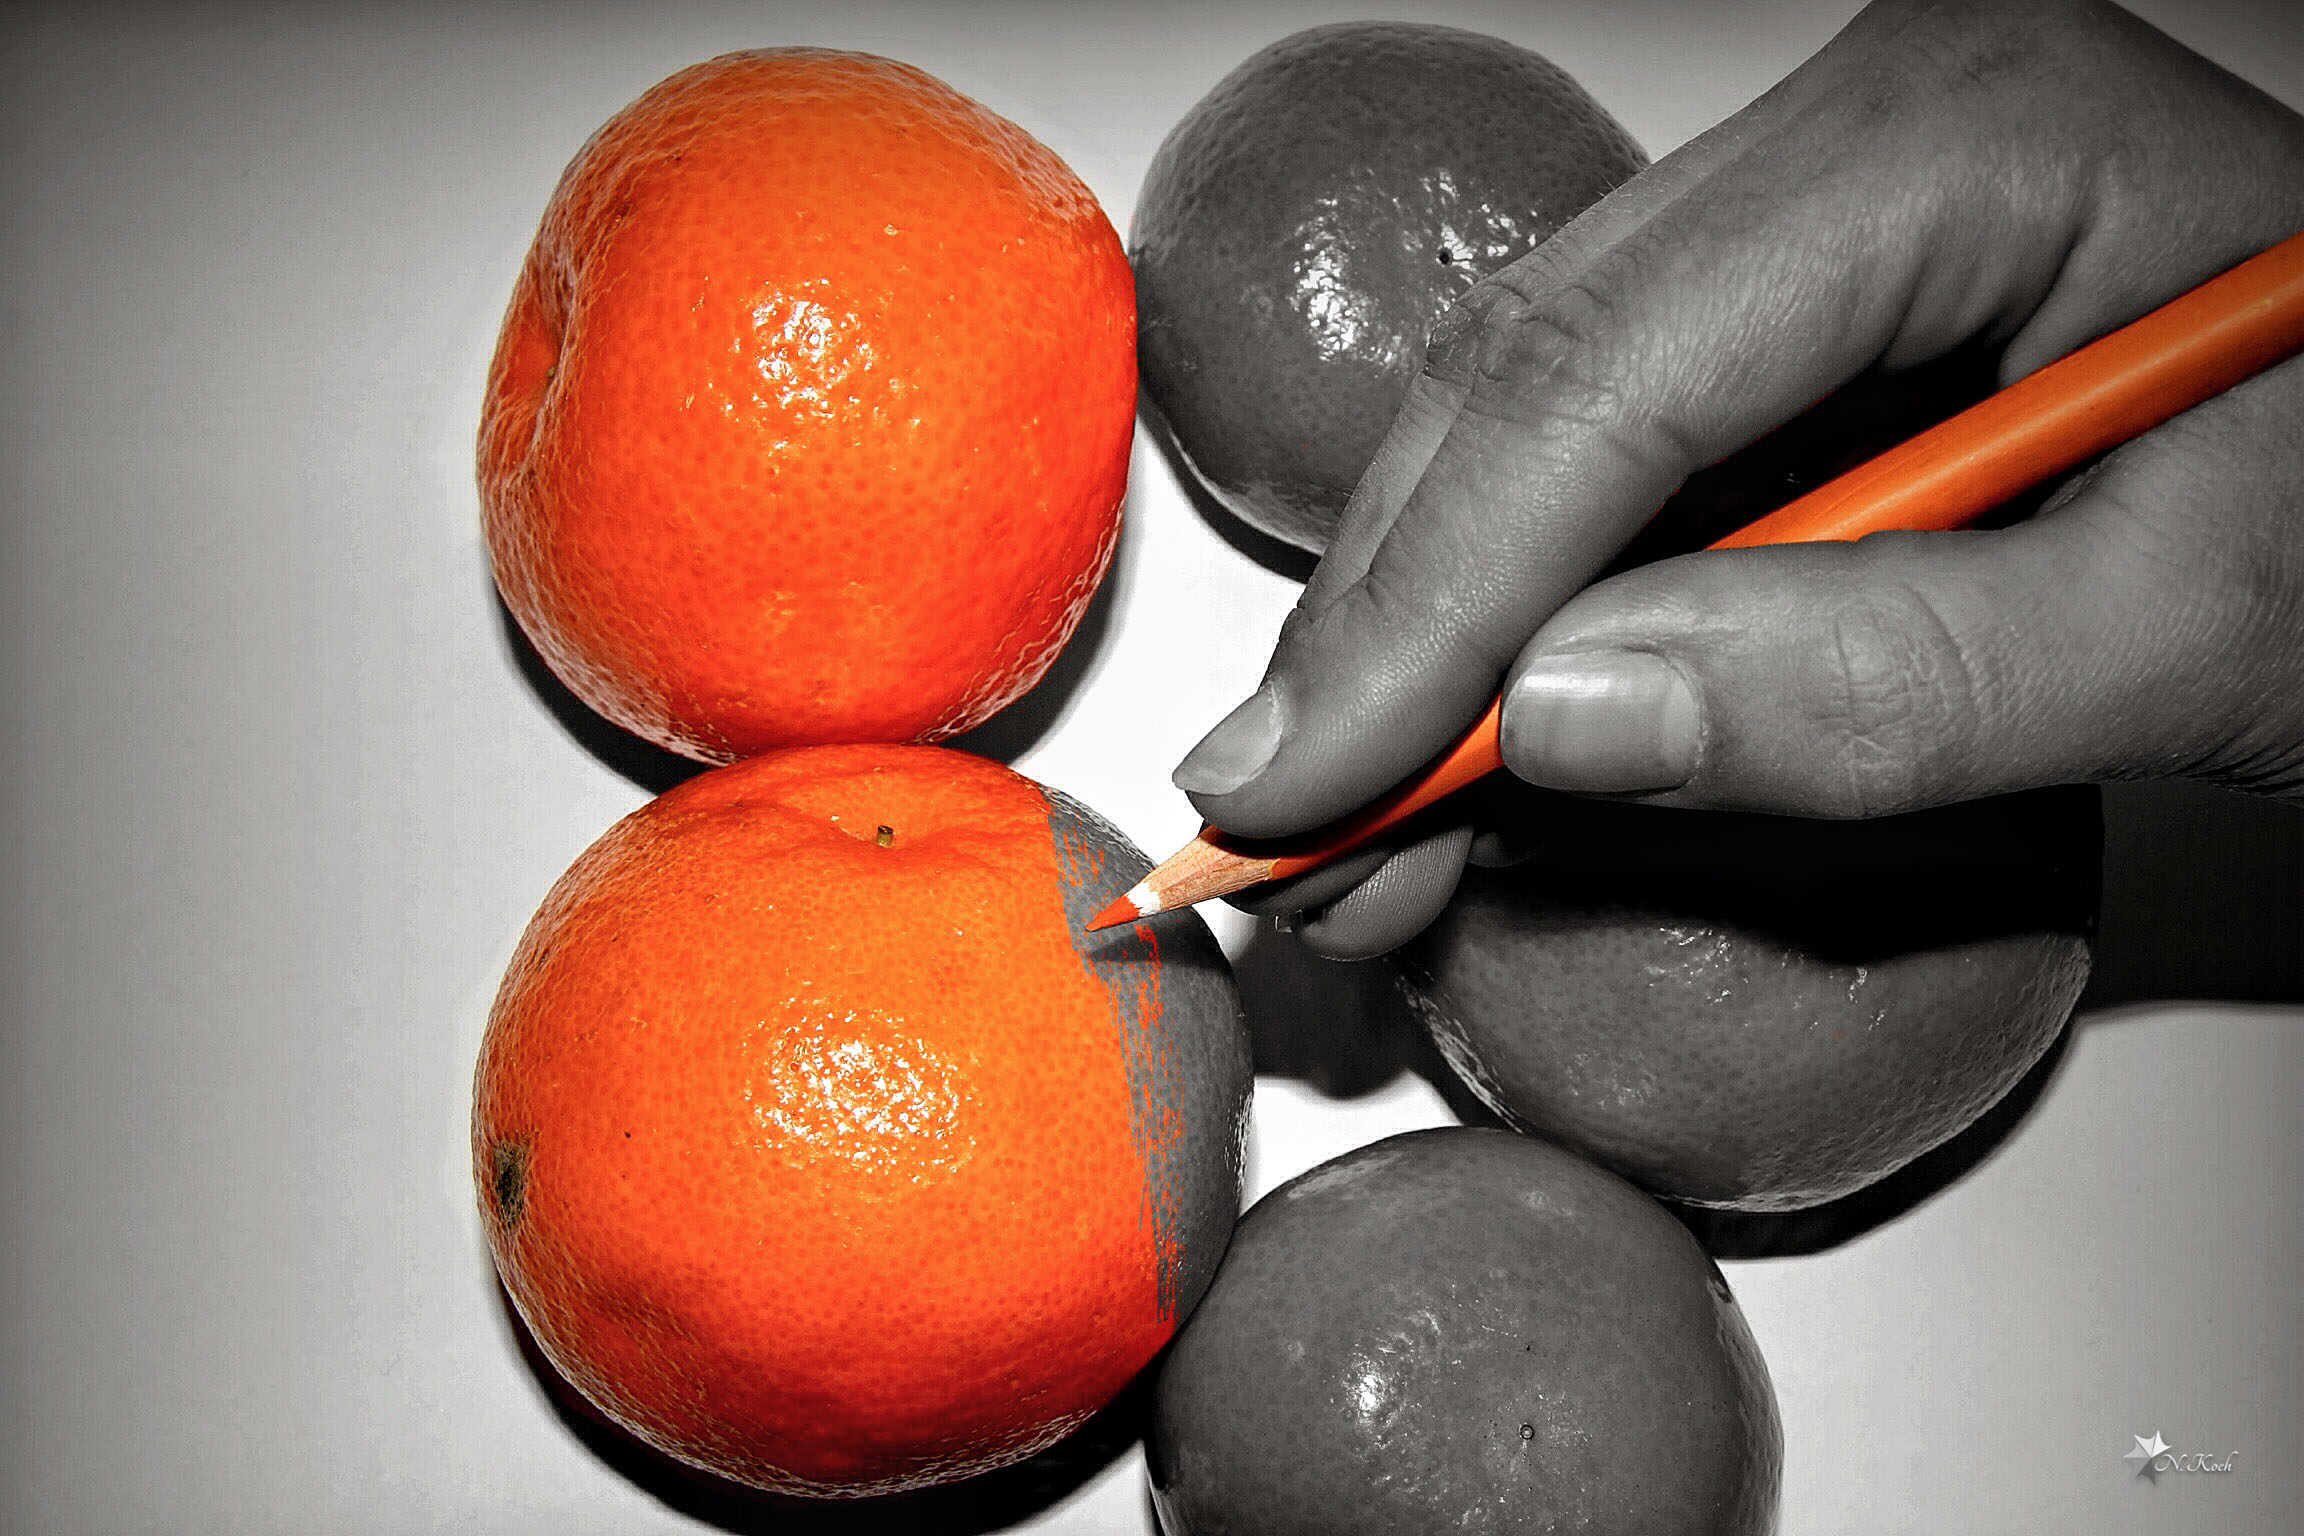 2014, Splash | Painting on the oranges